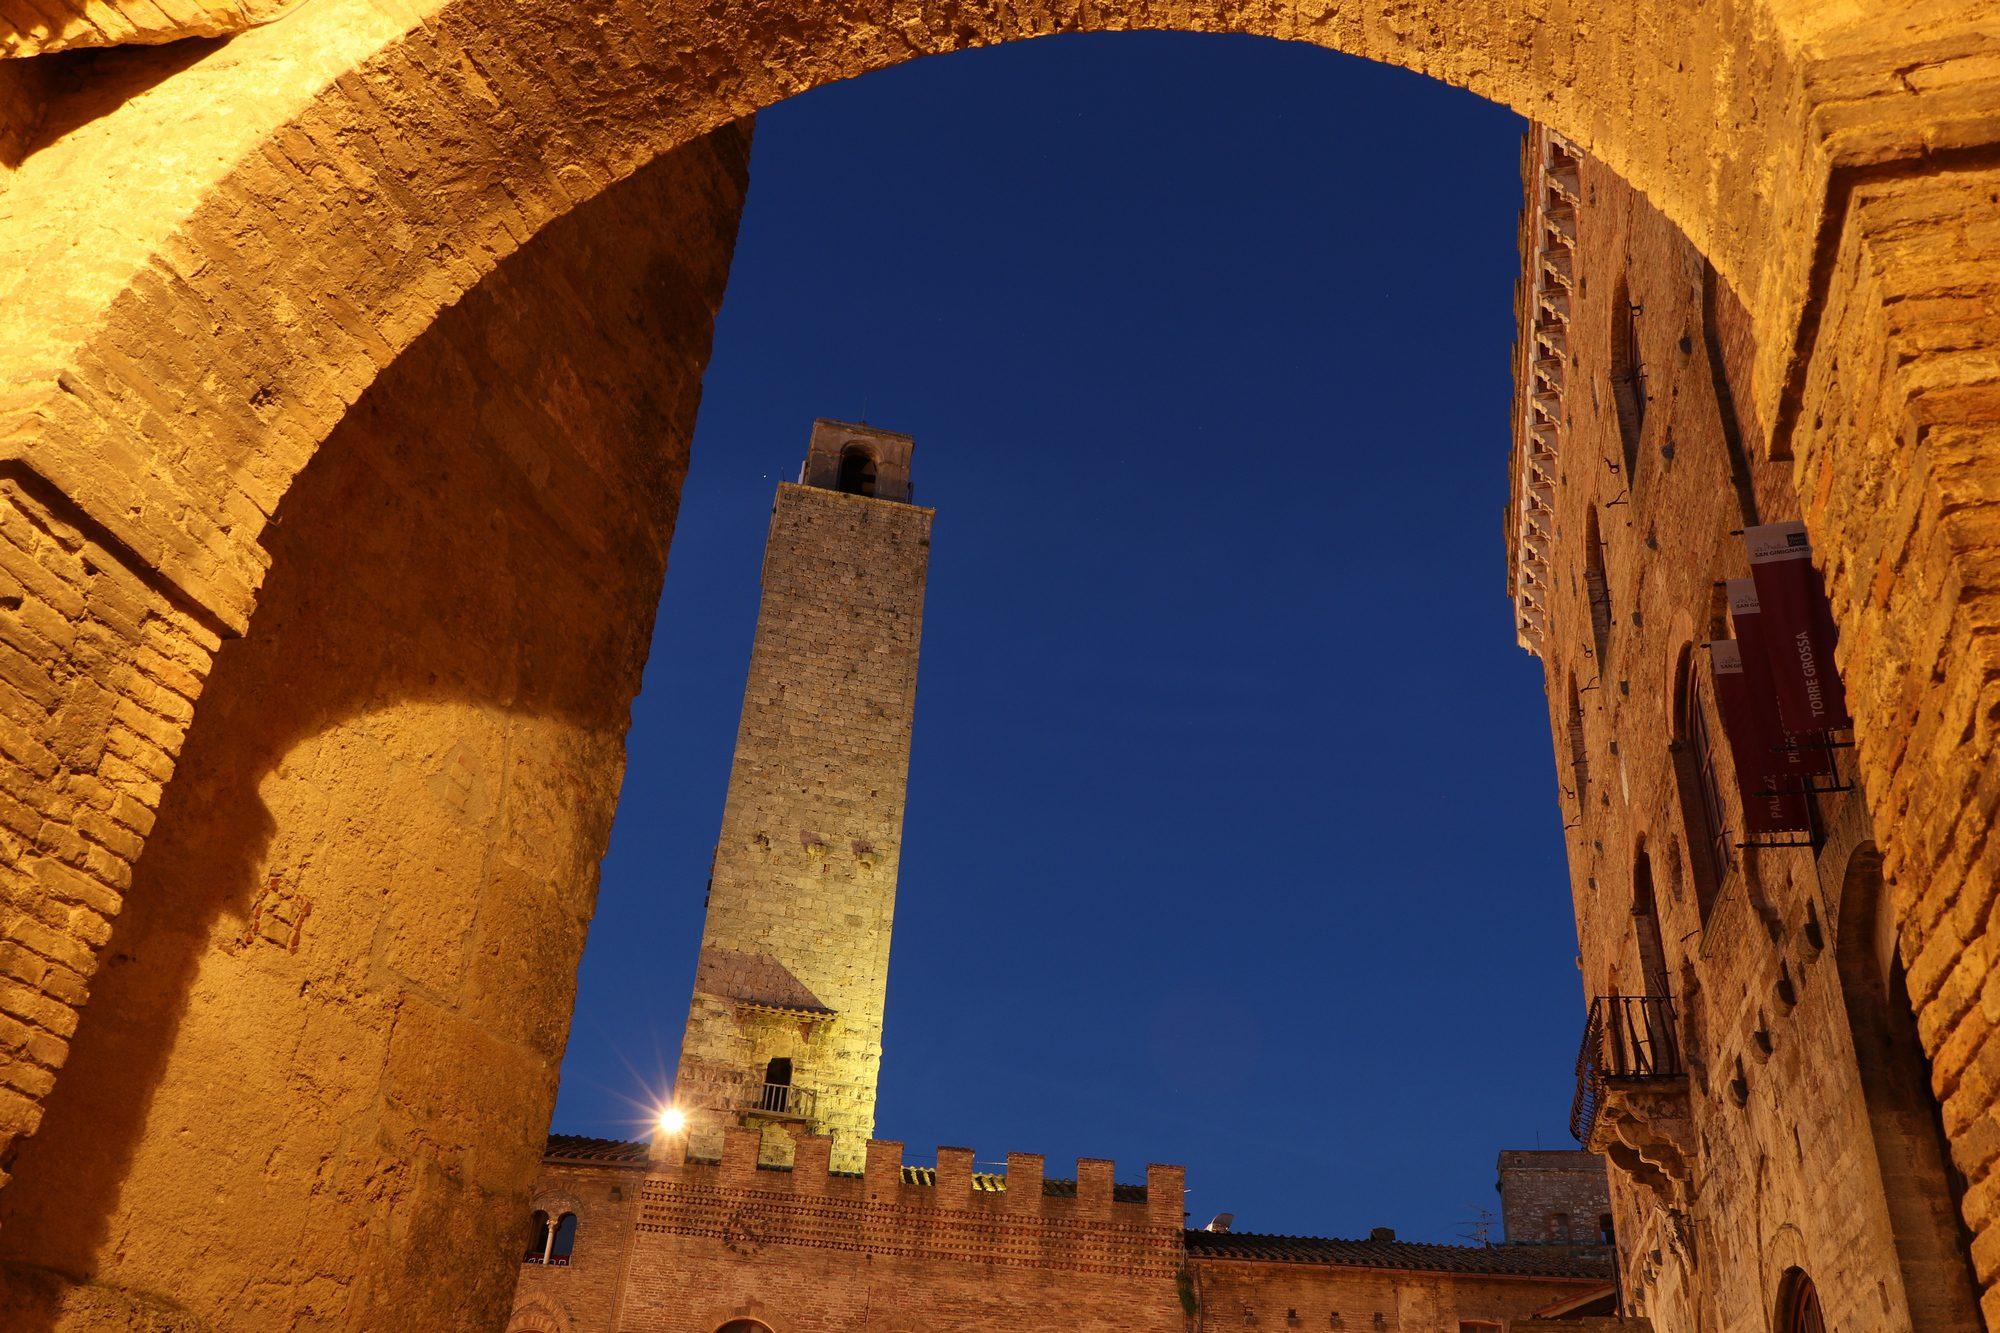 Blaue Stunde in San Gimignano in der Toskana Italien